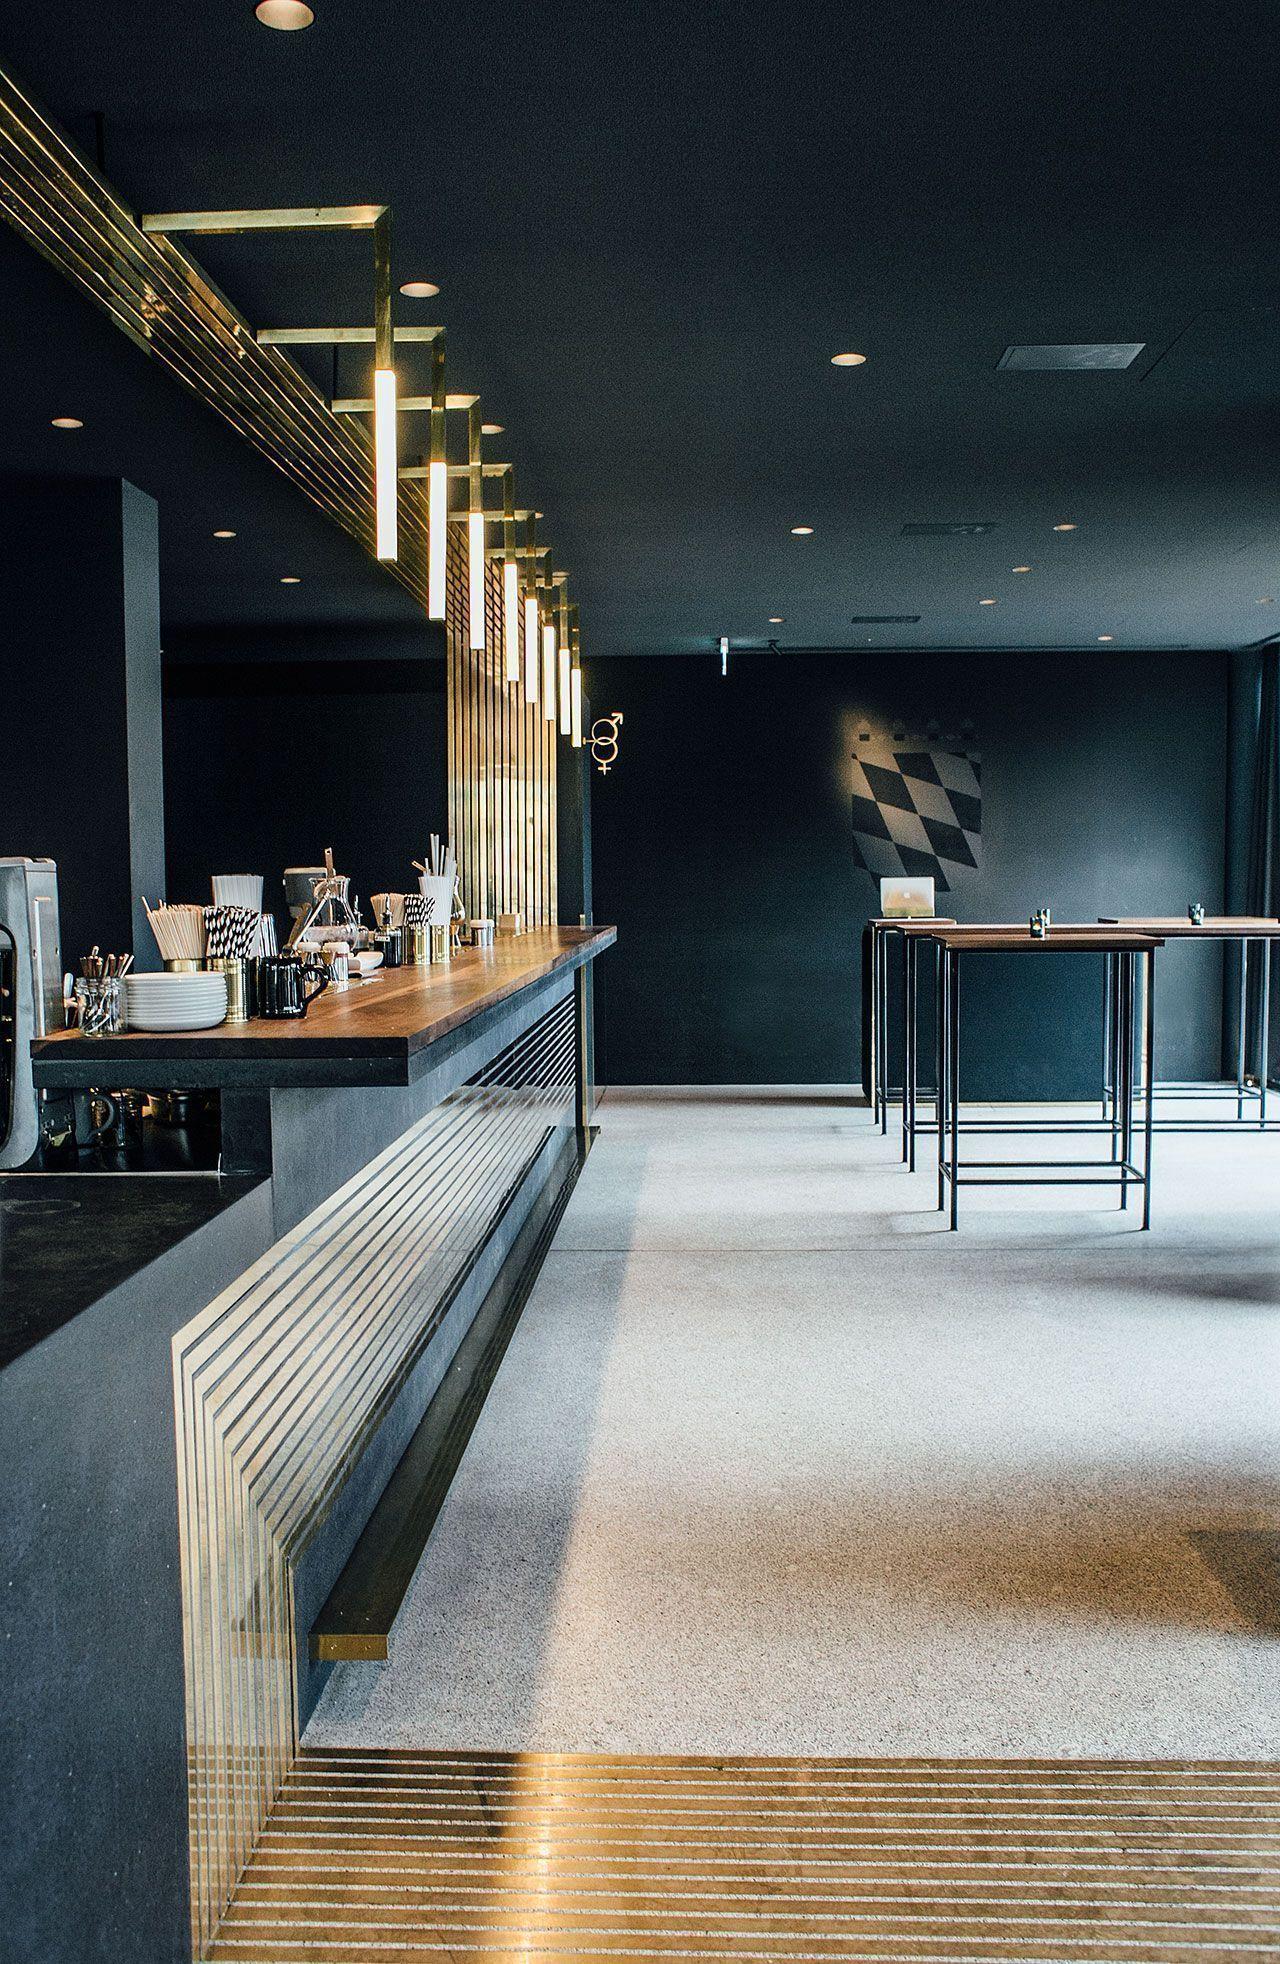 Restaurant design inspiratiamazing restaurant interior design ideas stylish cafe interior design projects bar interiors